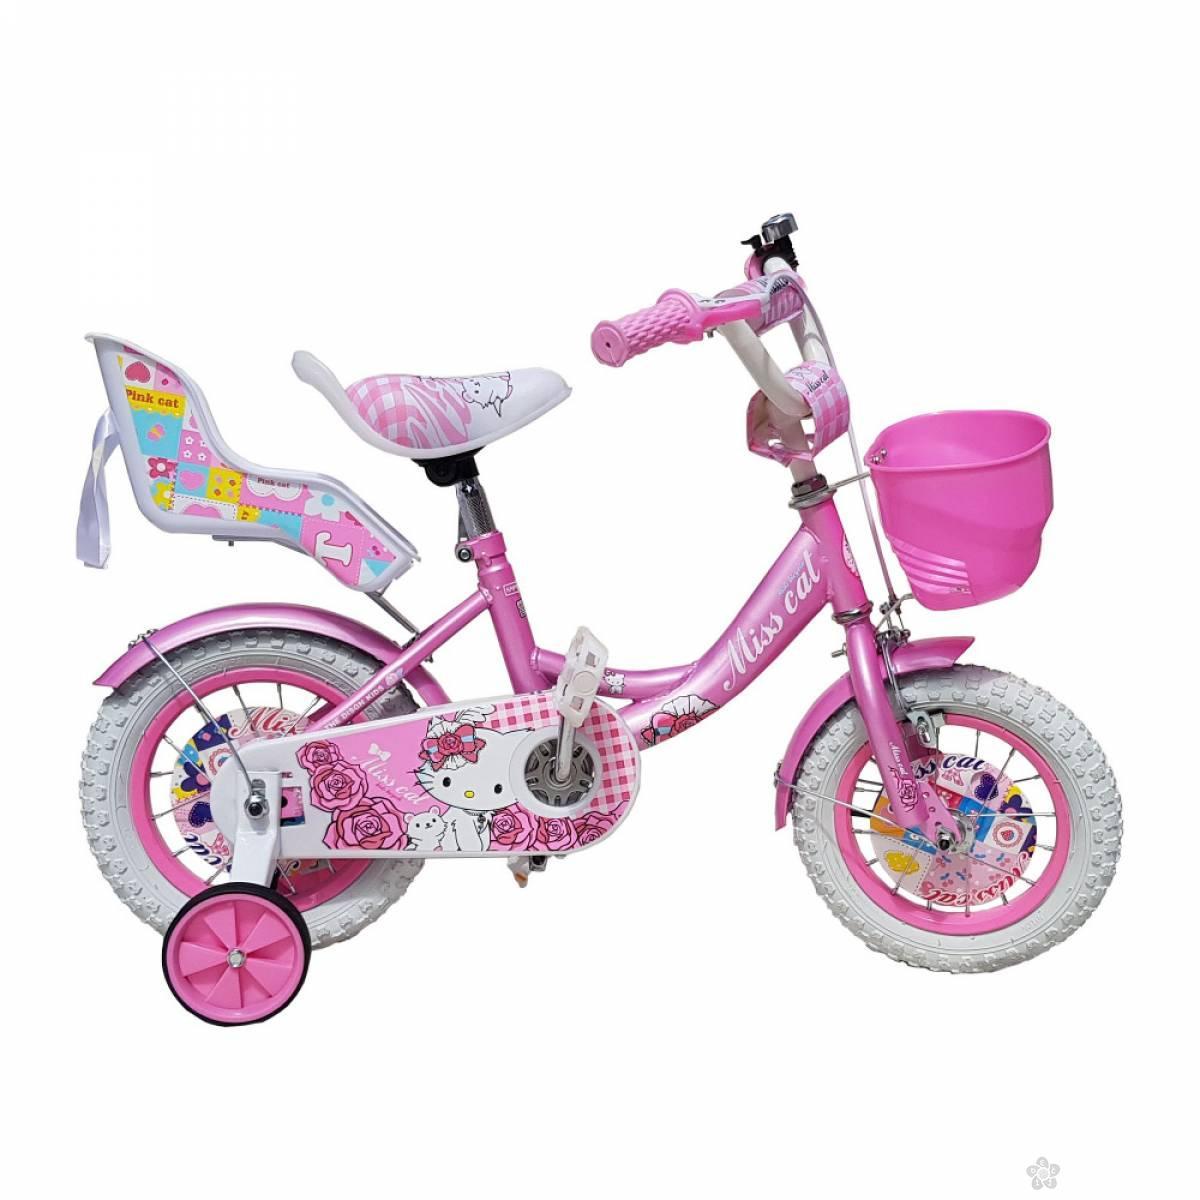 Bicikl za decu model 708-16″ Miss Cat rozi